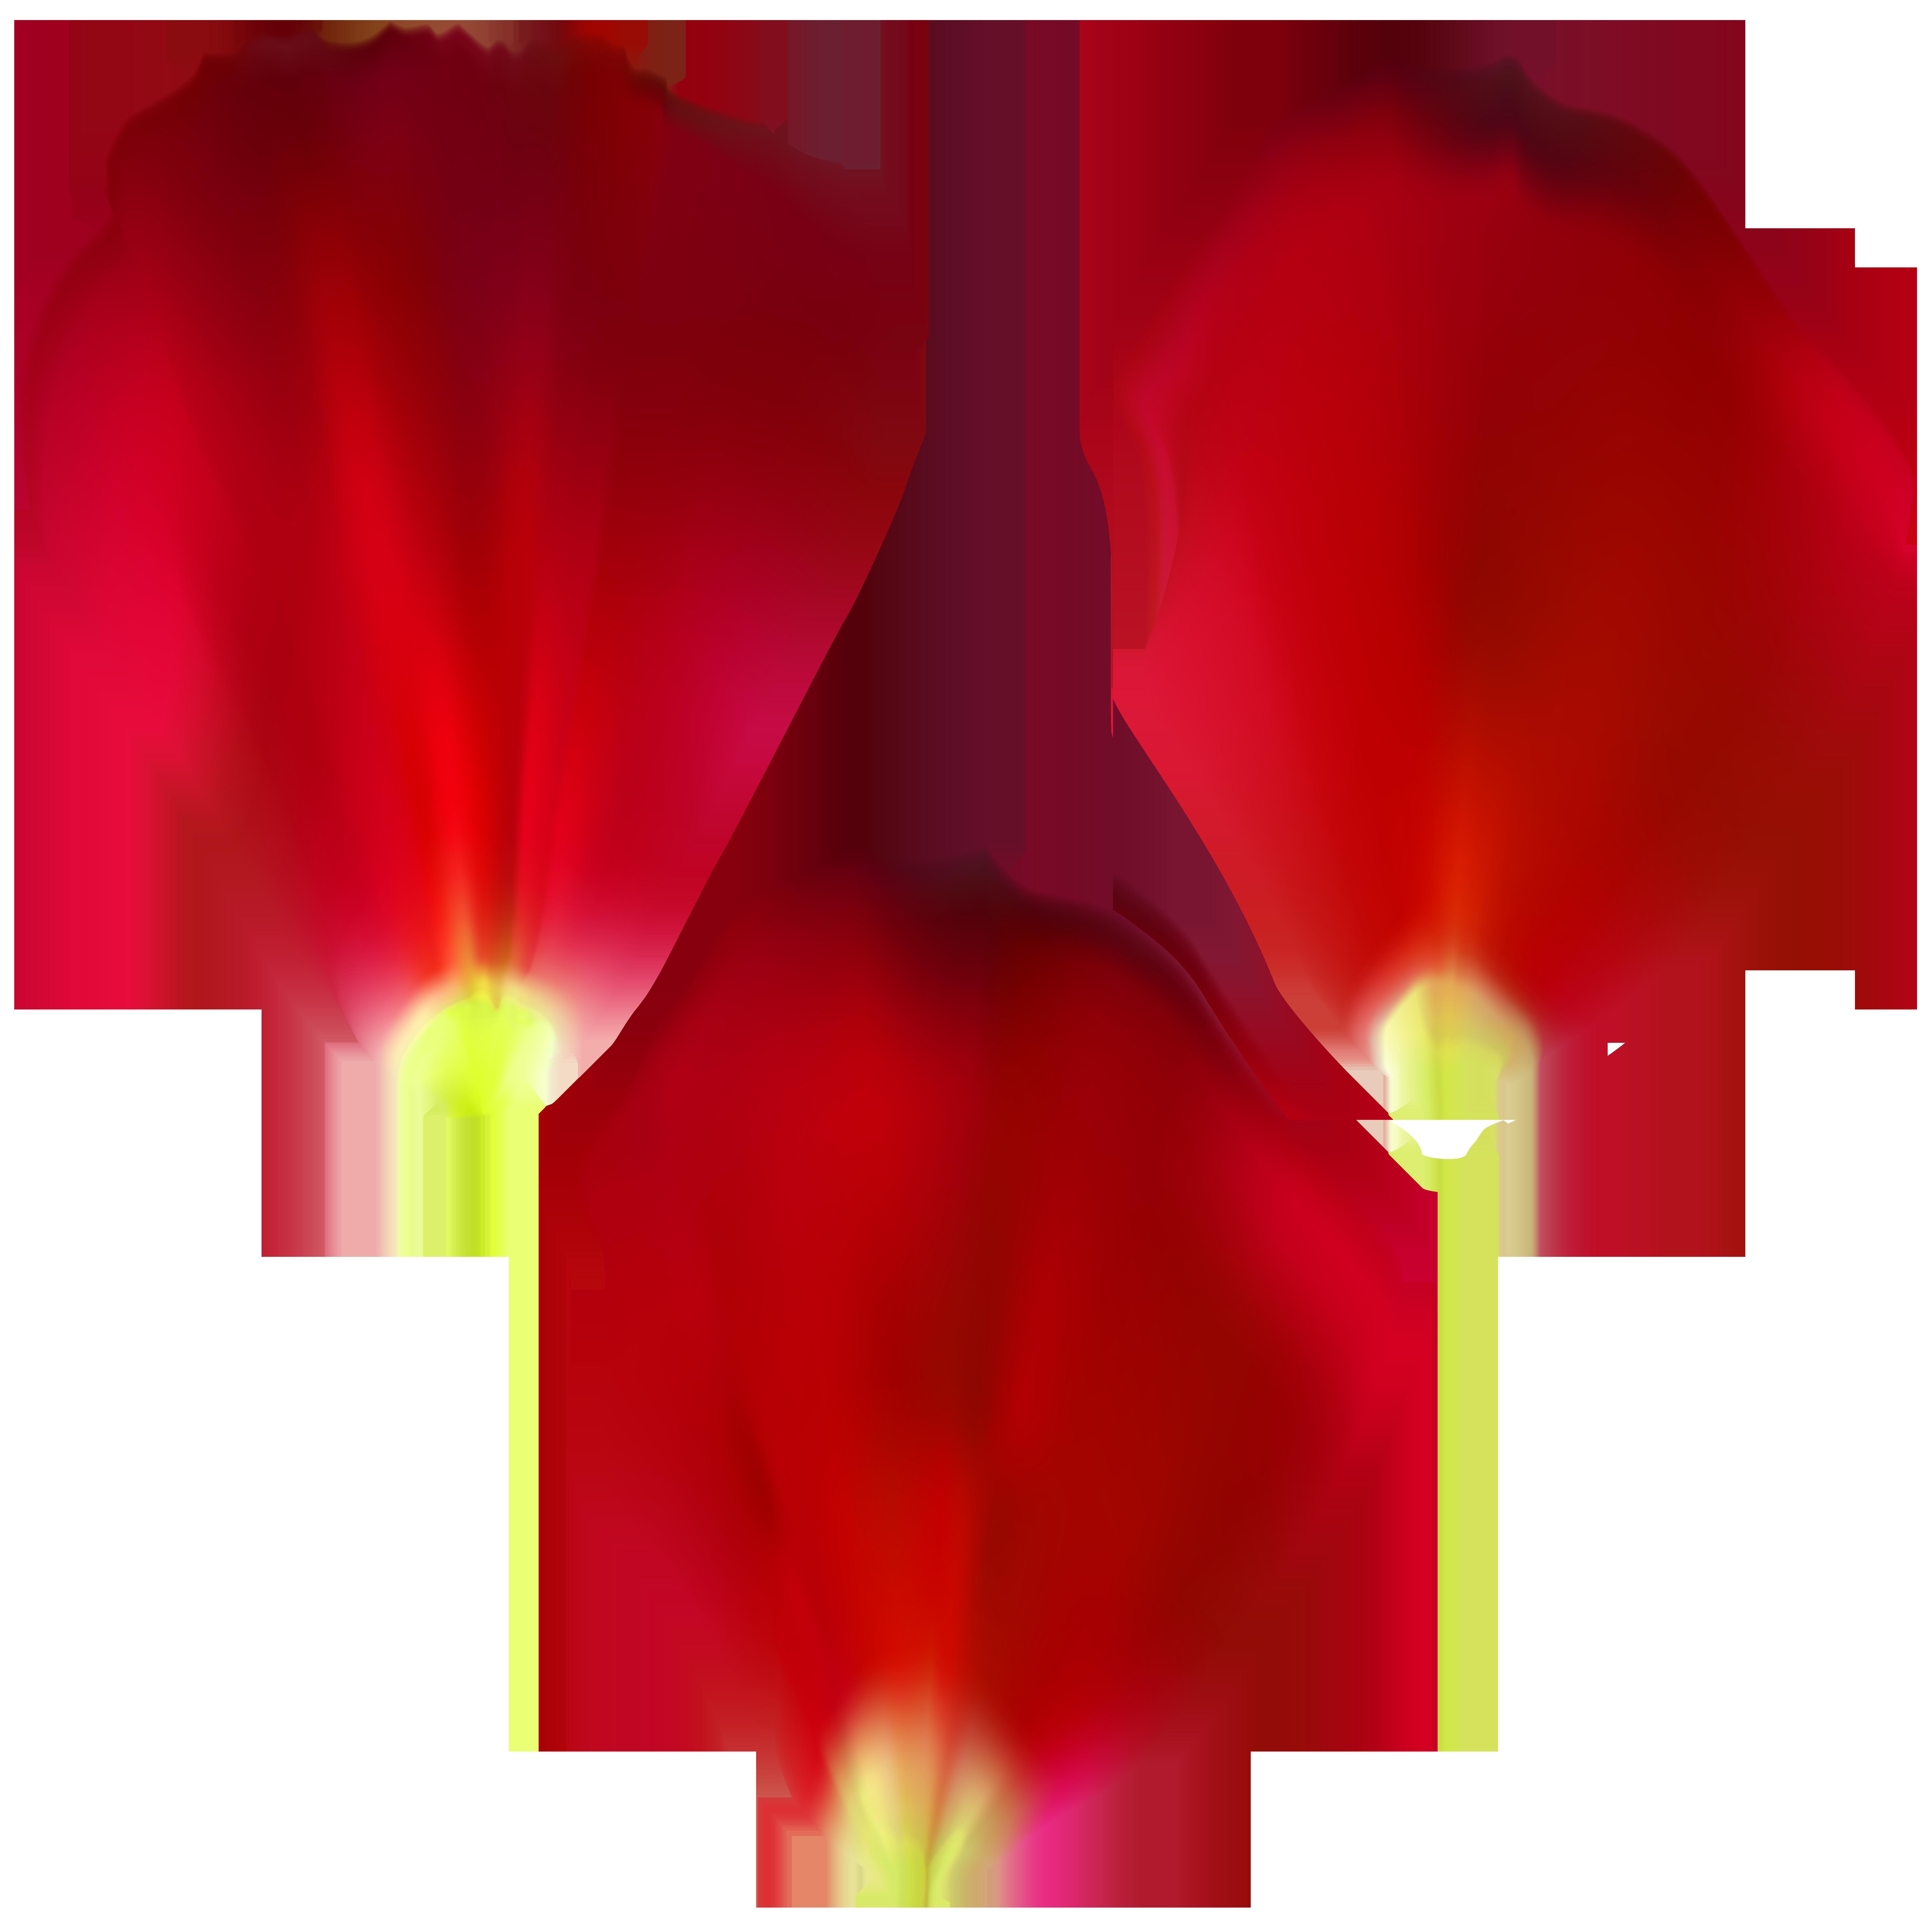 Rose petal clipart clip freeuse download Rose Petals Set Transparent Clip Art | Gallery Yopriceville ... clip freeuse download